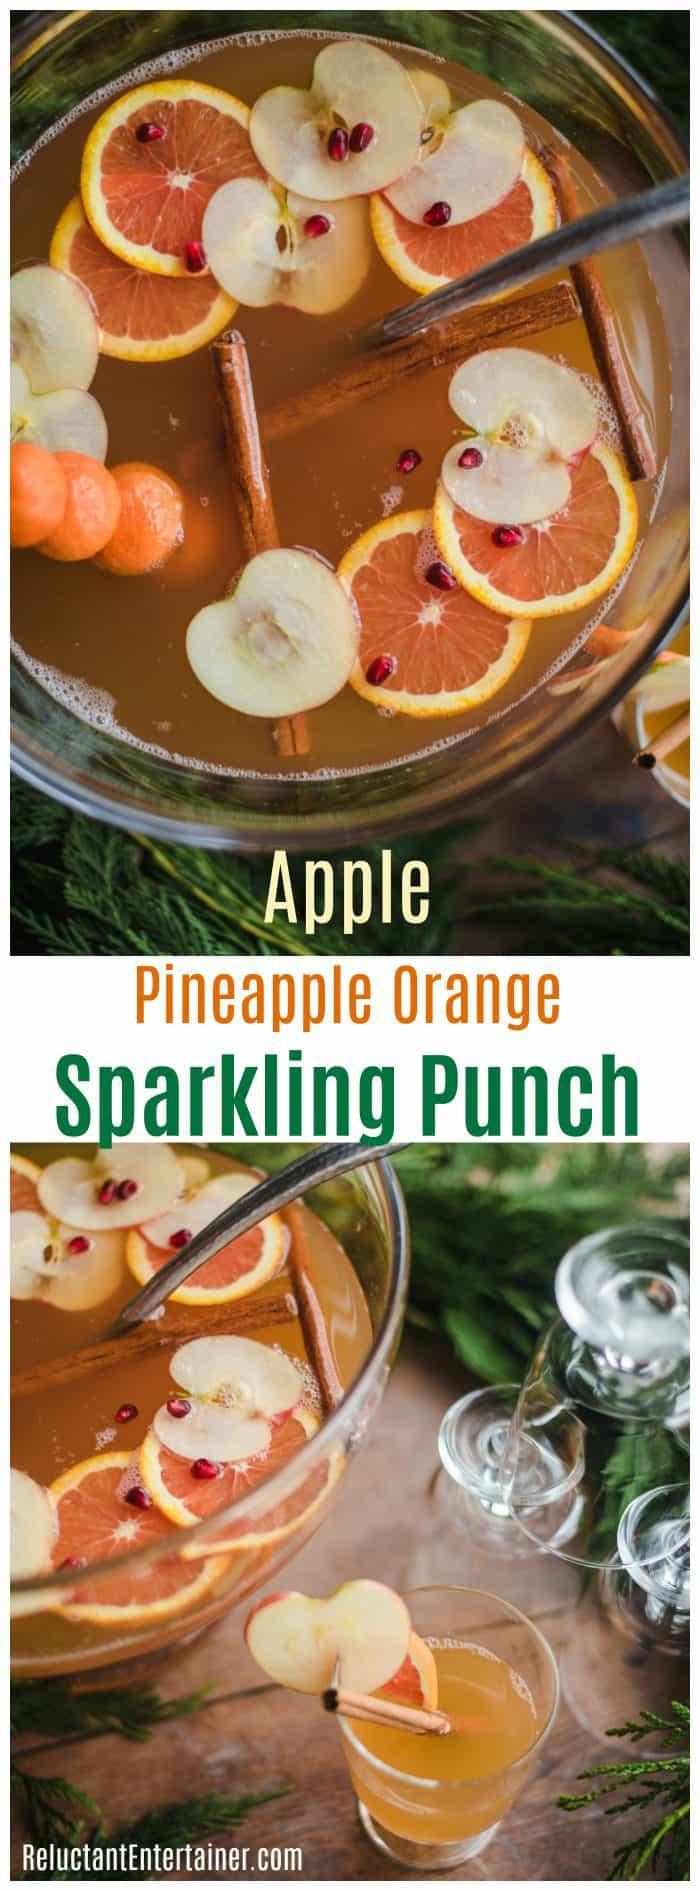 Apple Pineapple Orange Sparkling Punch Recipe